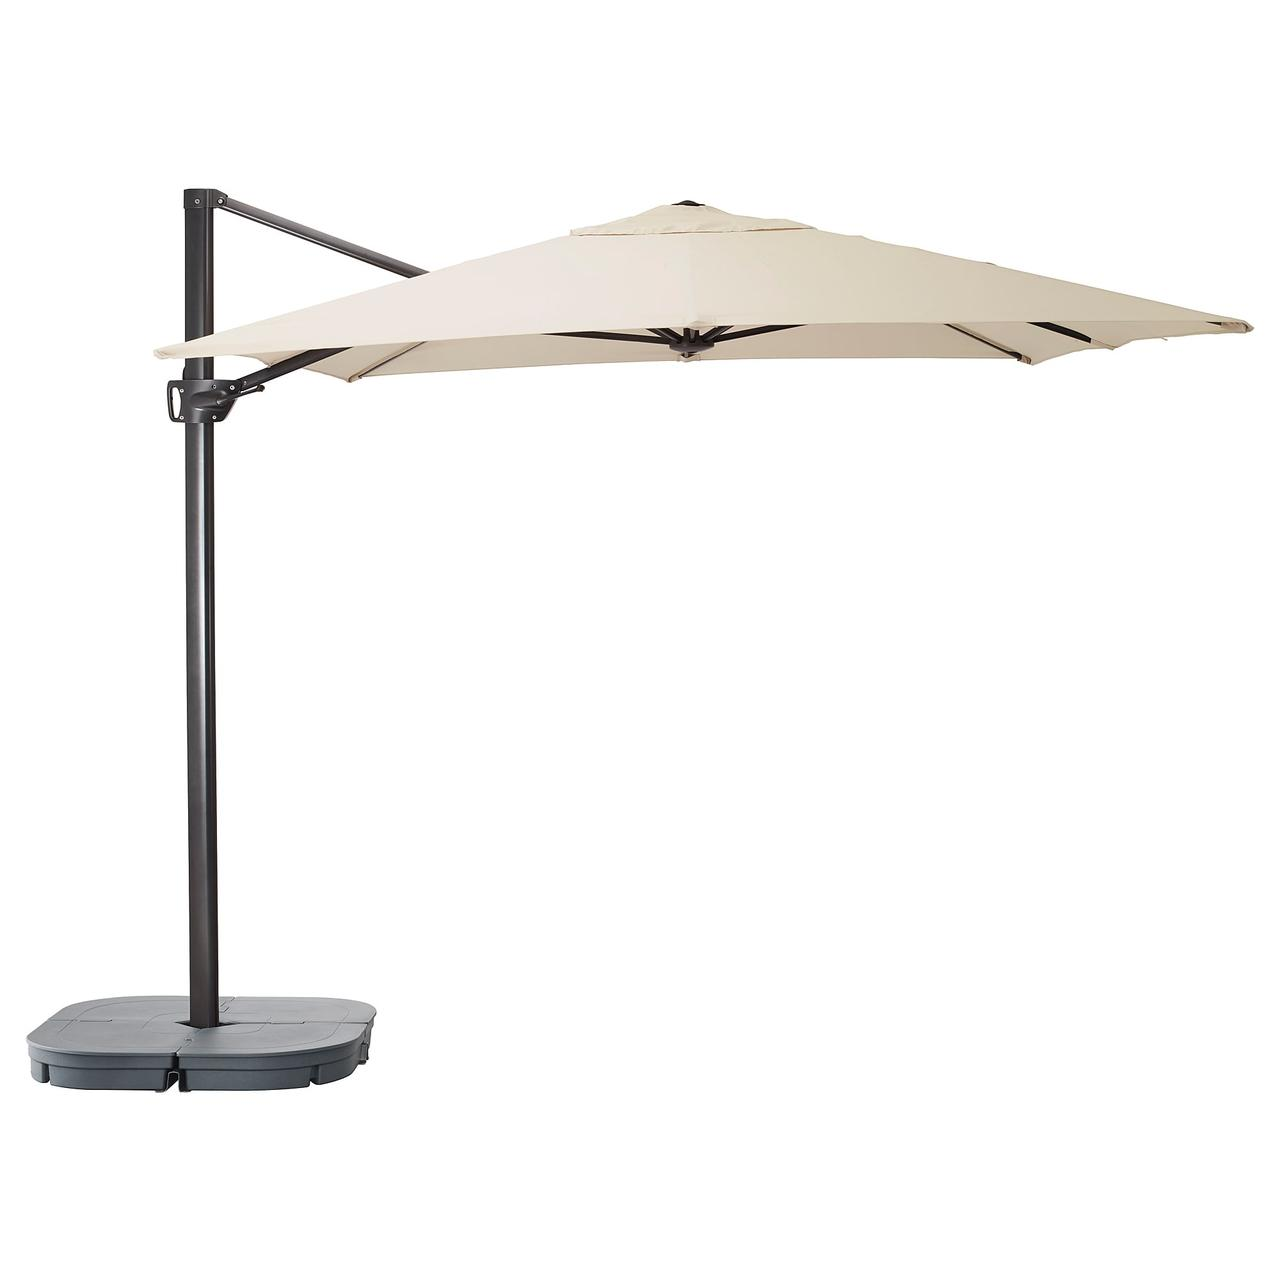 СЕГЛАРО / СВАРТО Зонт от солнца с опорой, наклонный бежевый, темно-серый